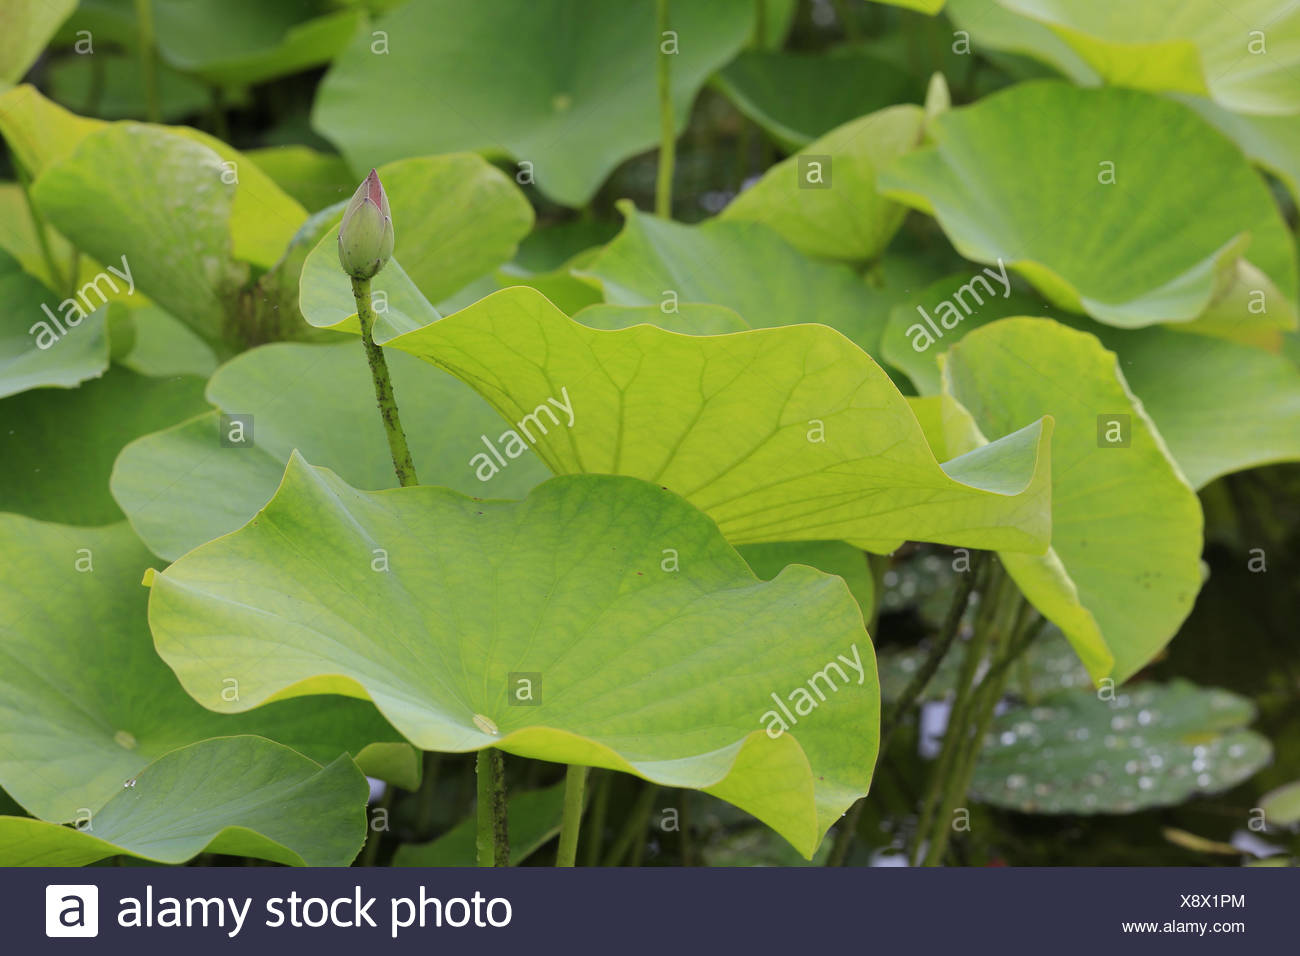 Indian lotus flower leaves stock photos indian lotus flower leaves indian lotus flower leaves with bud nelumbo nucifera stock image mightylinksfo